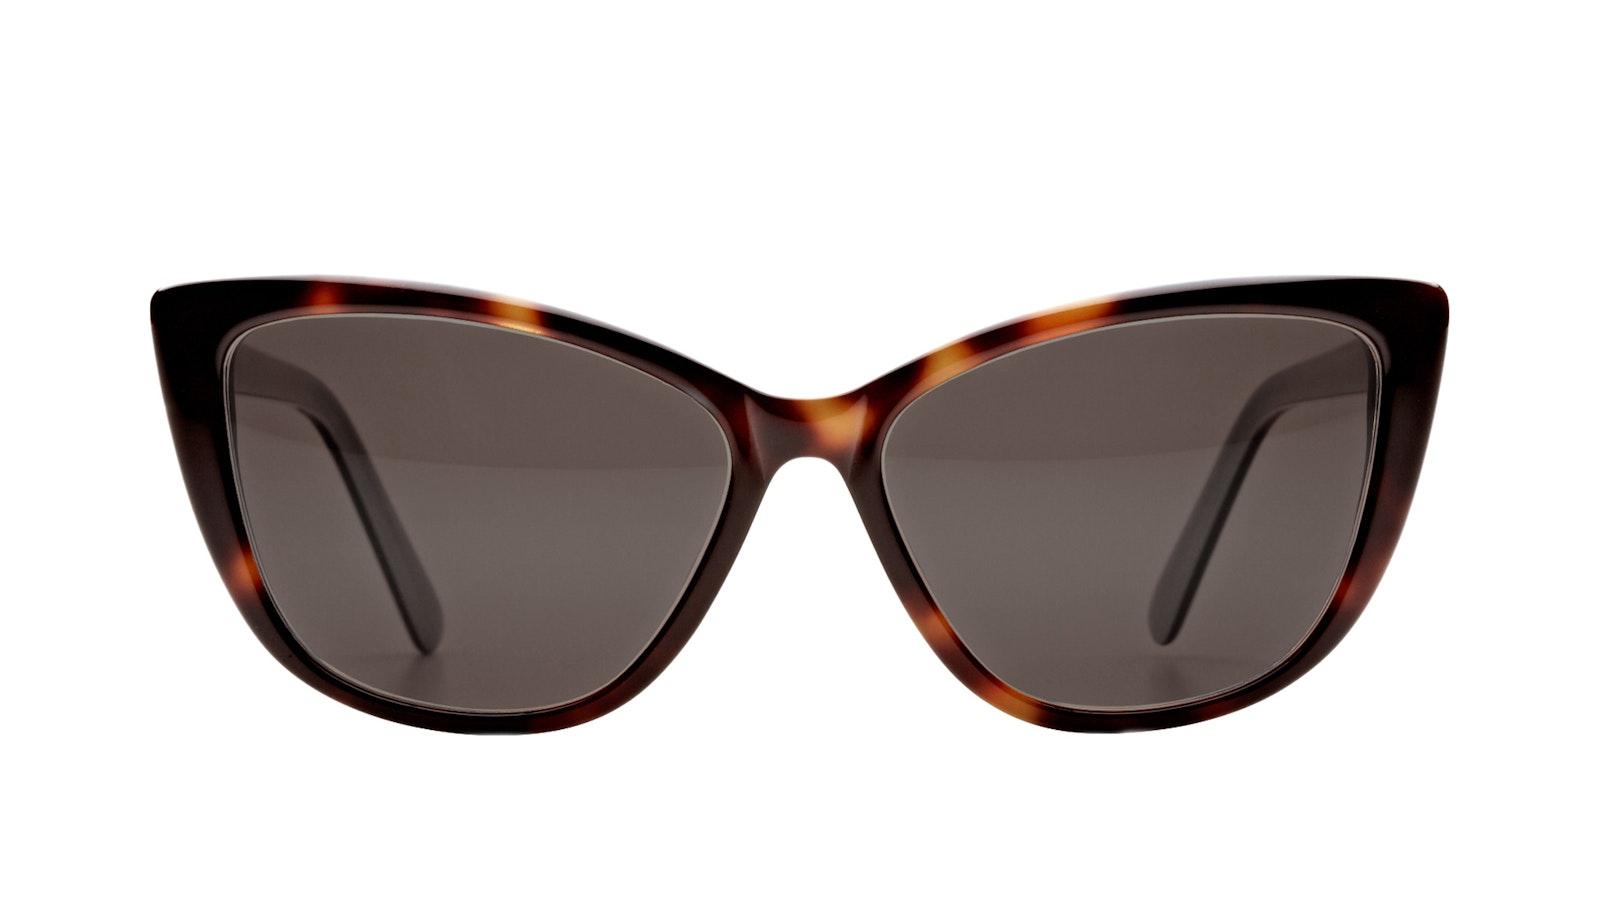 Affordable Fashion Glasses Cat Eye Daring Cateye Sunglasses Women Dolled Up Dreamy Tortoise